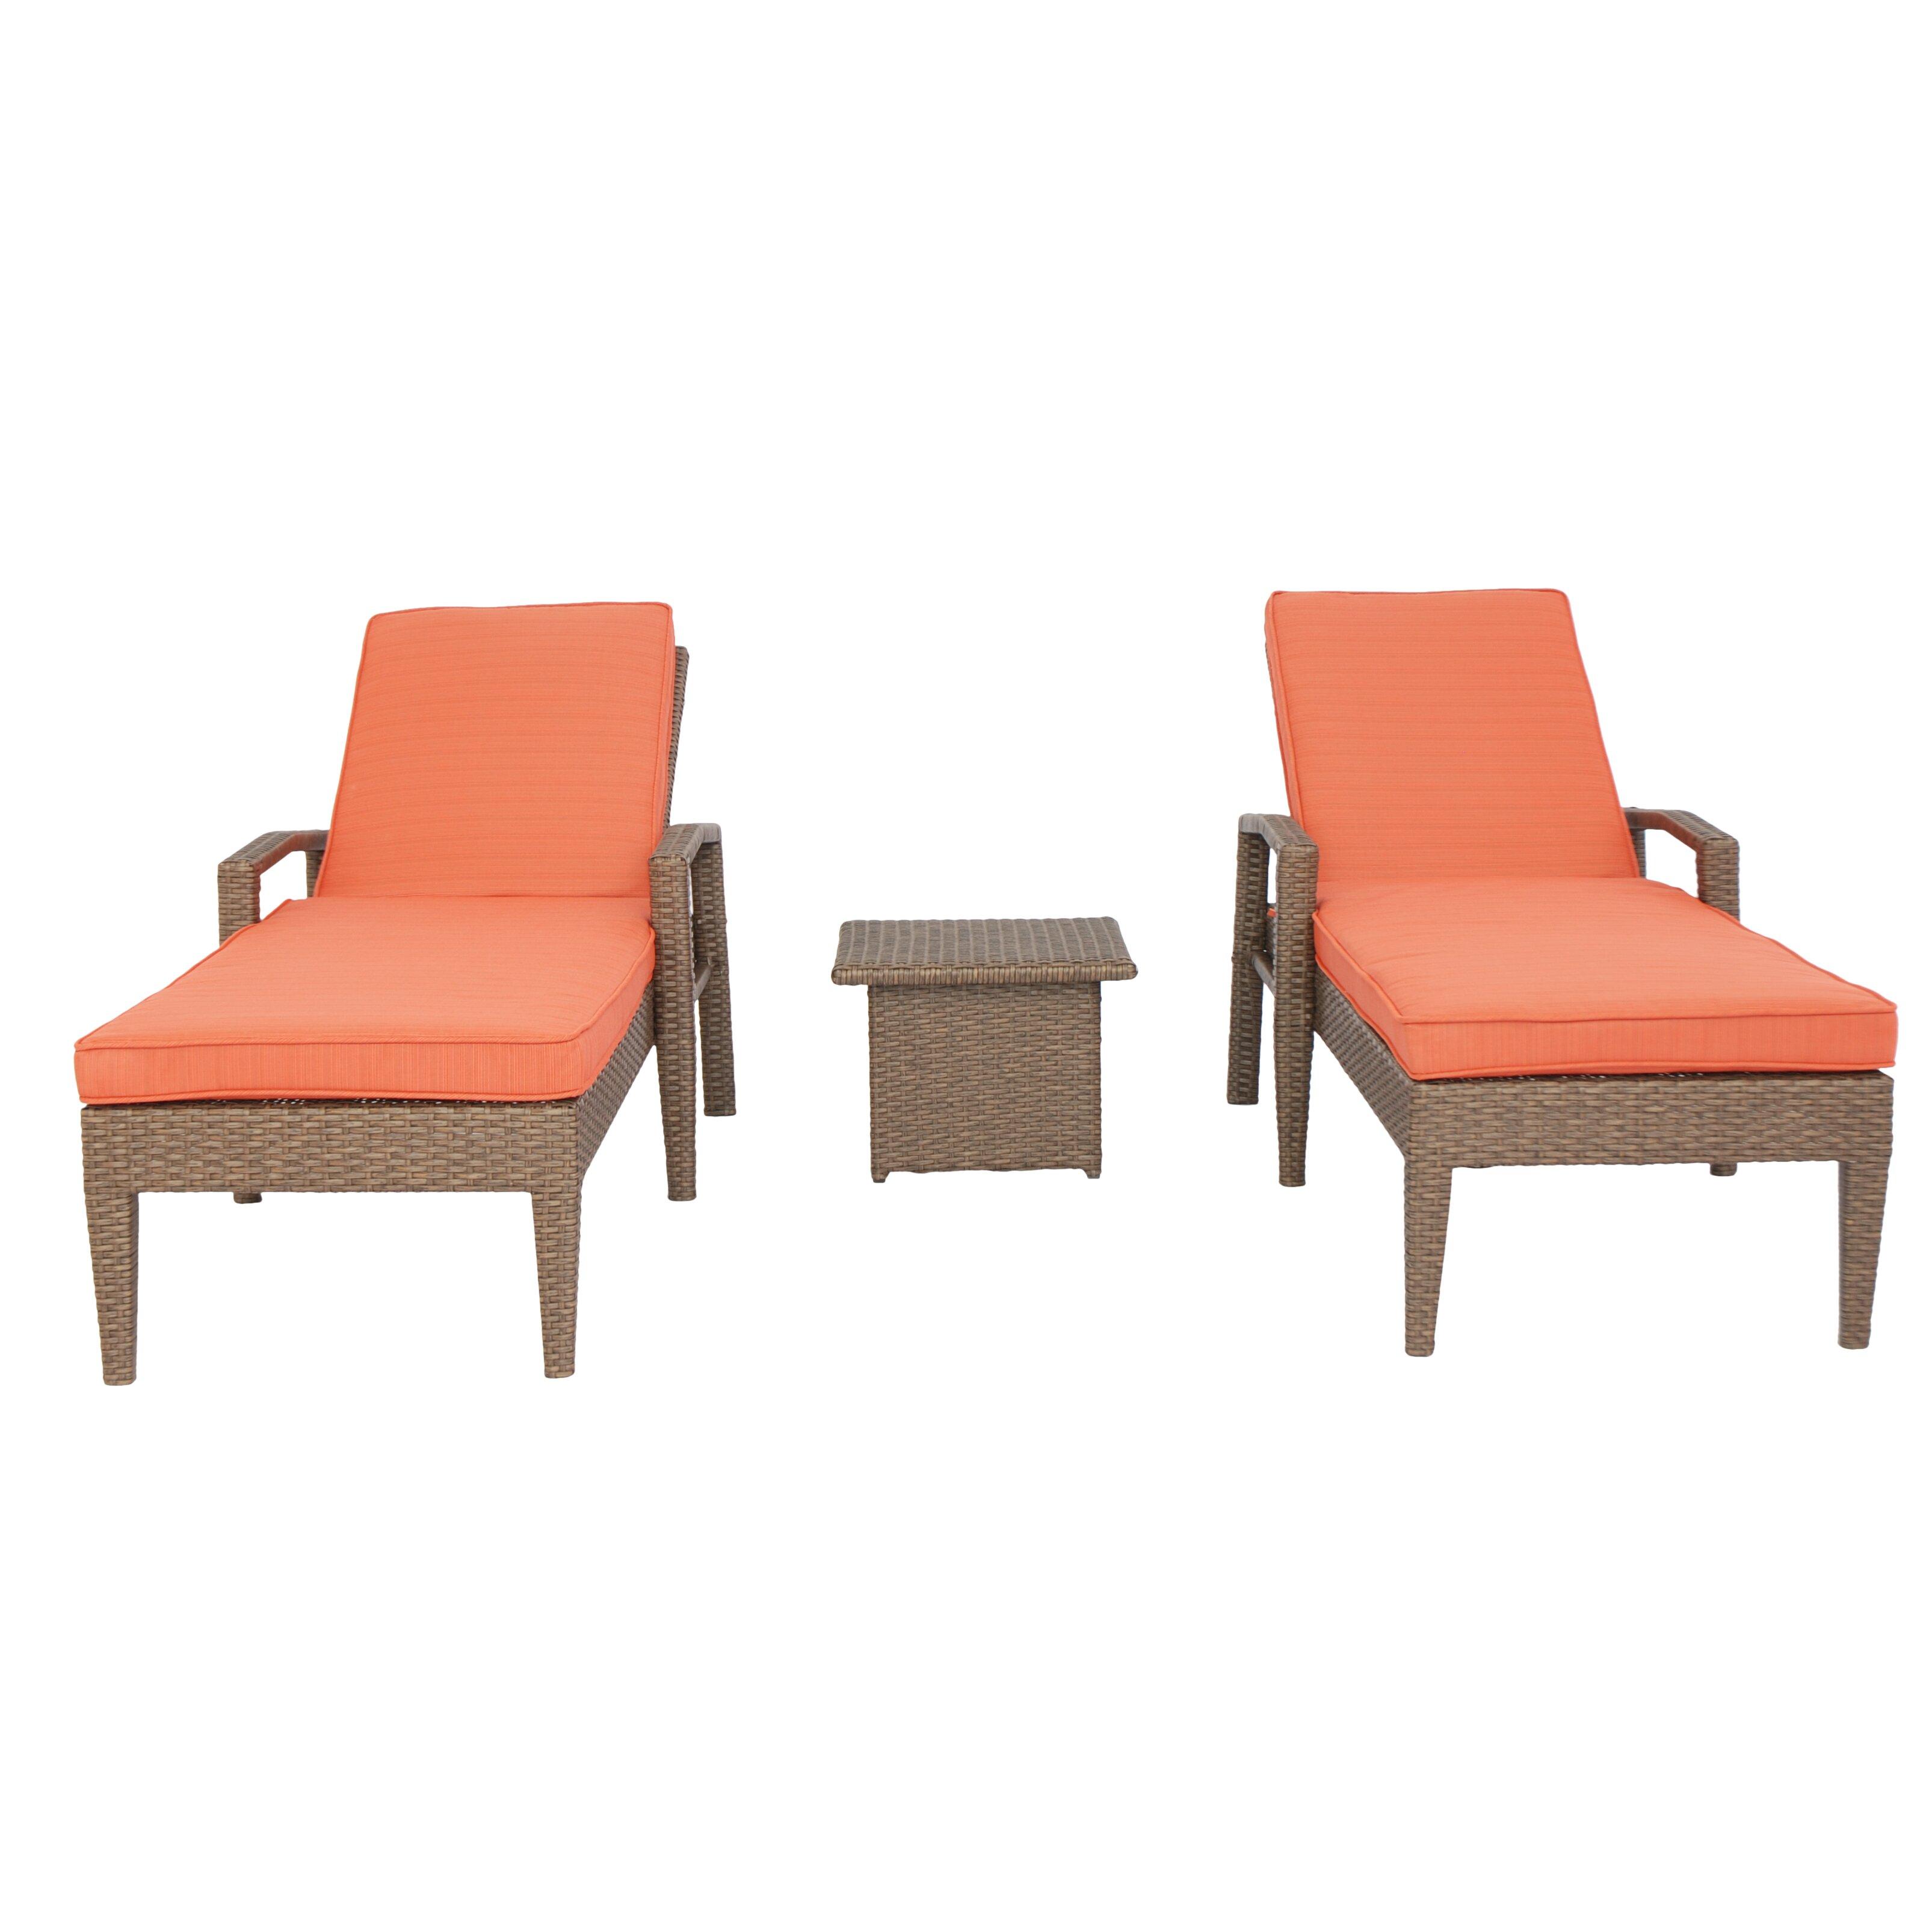 Brayden Studio Ferber 3 Piece Chaise Lounge Set With Cushions Allmodern